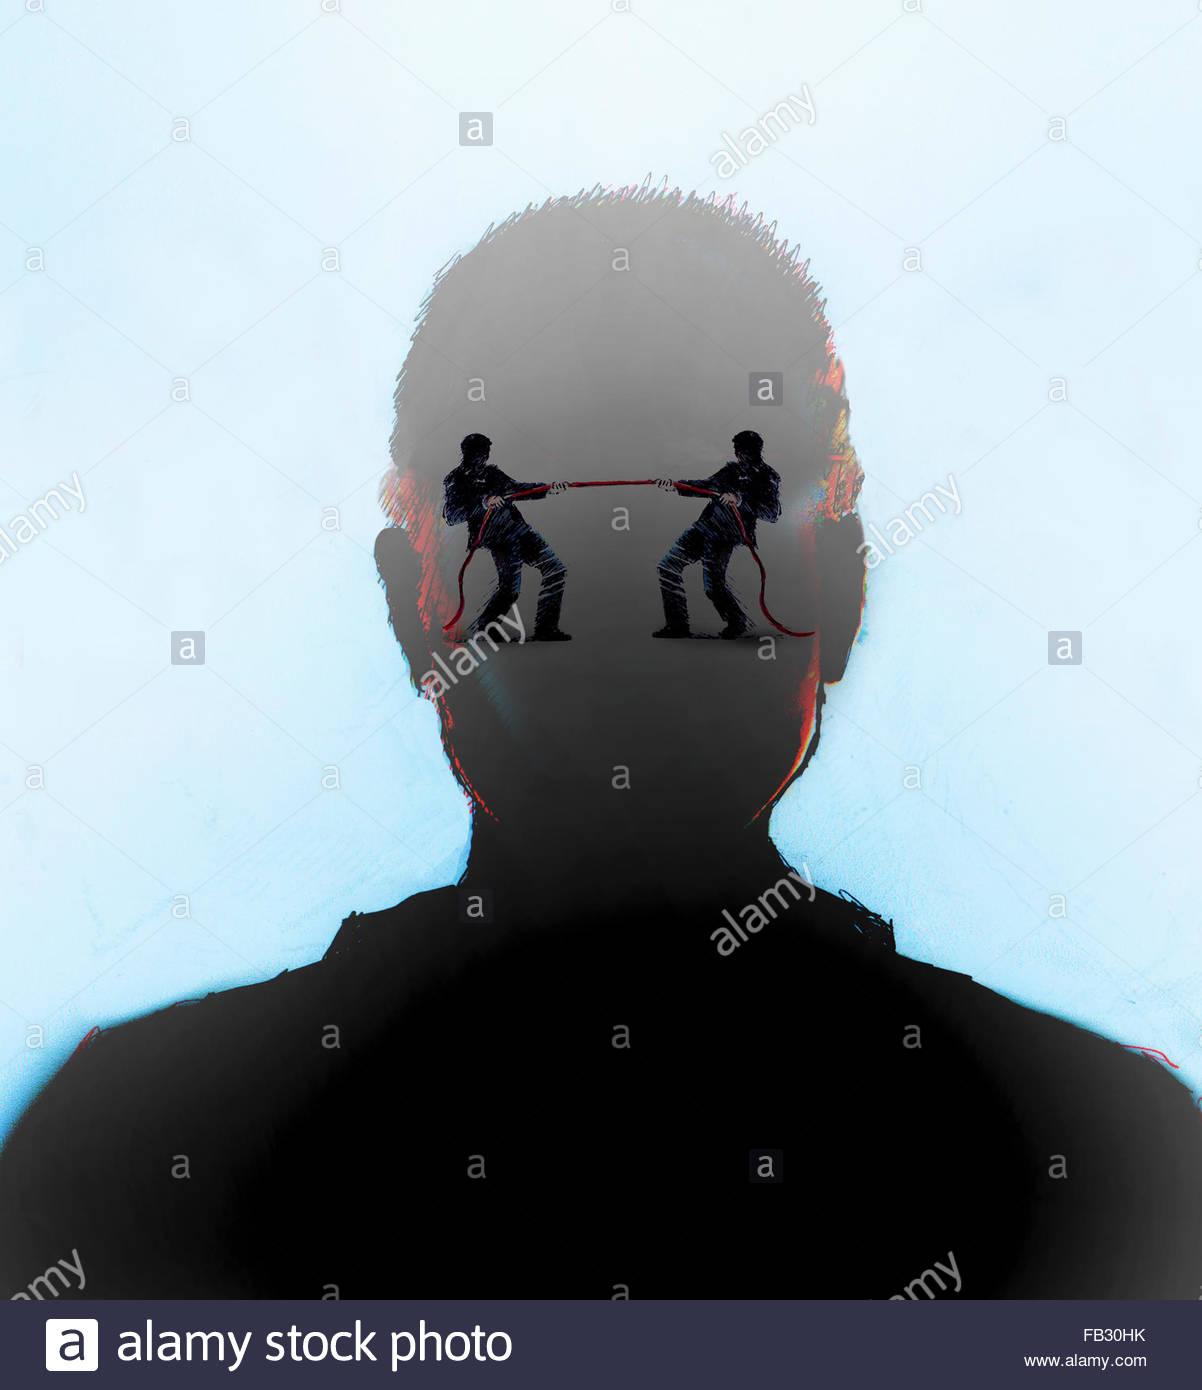 Businessmen in tug of war inside of man's head - Stock Image